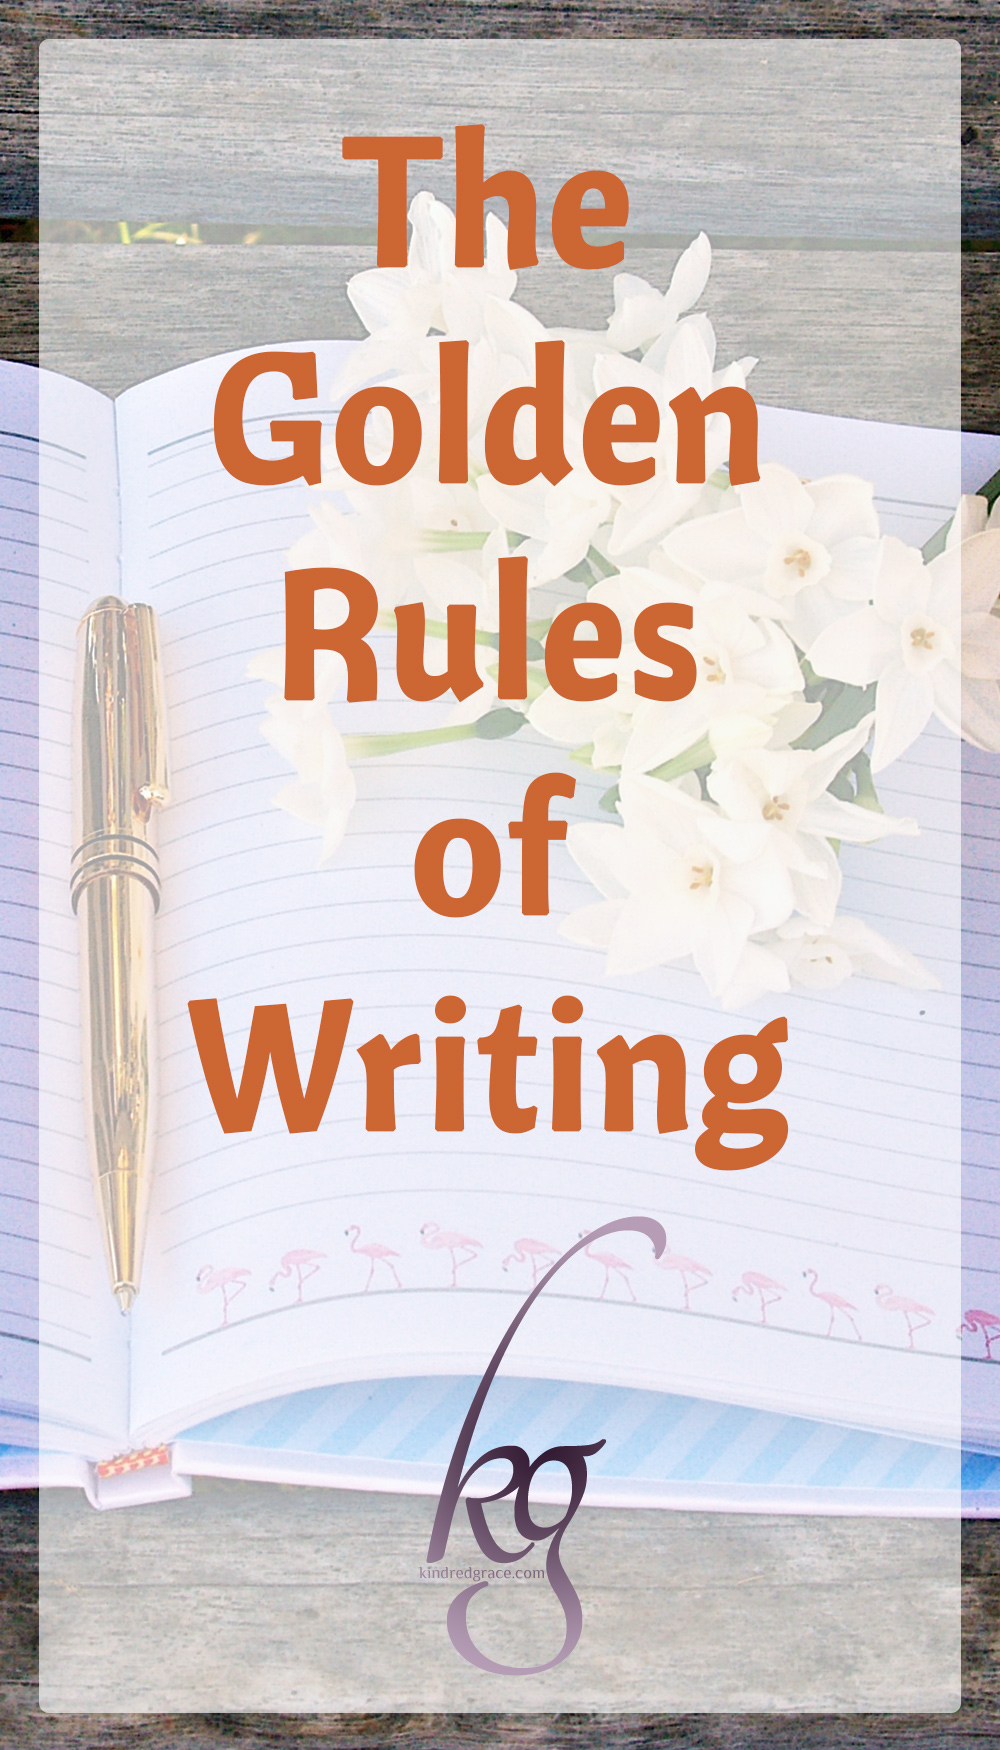 The Golden Rules of Writing via @KindredGrace